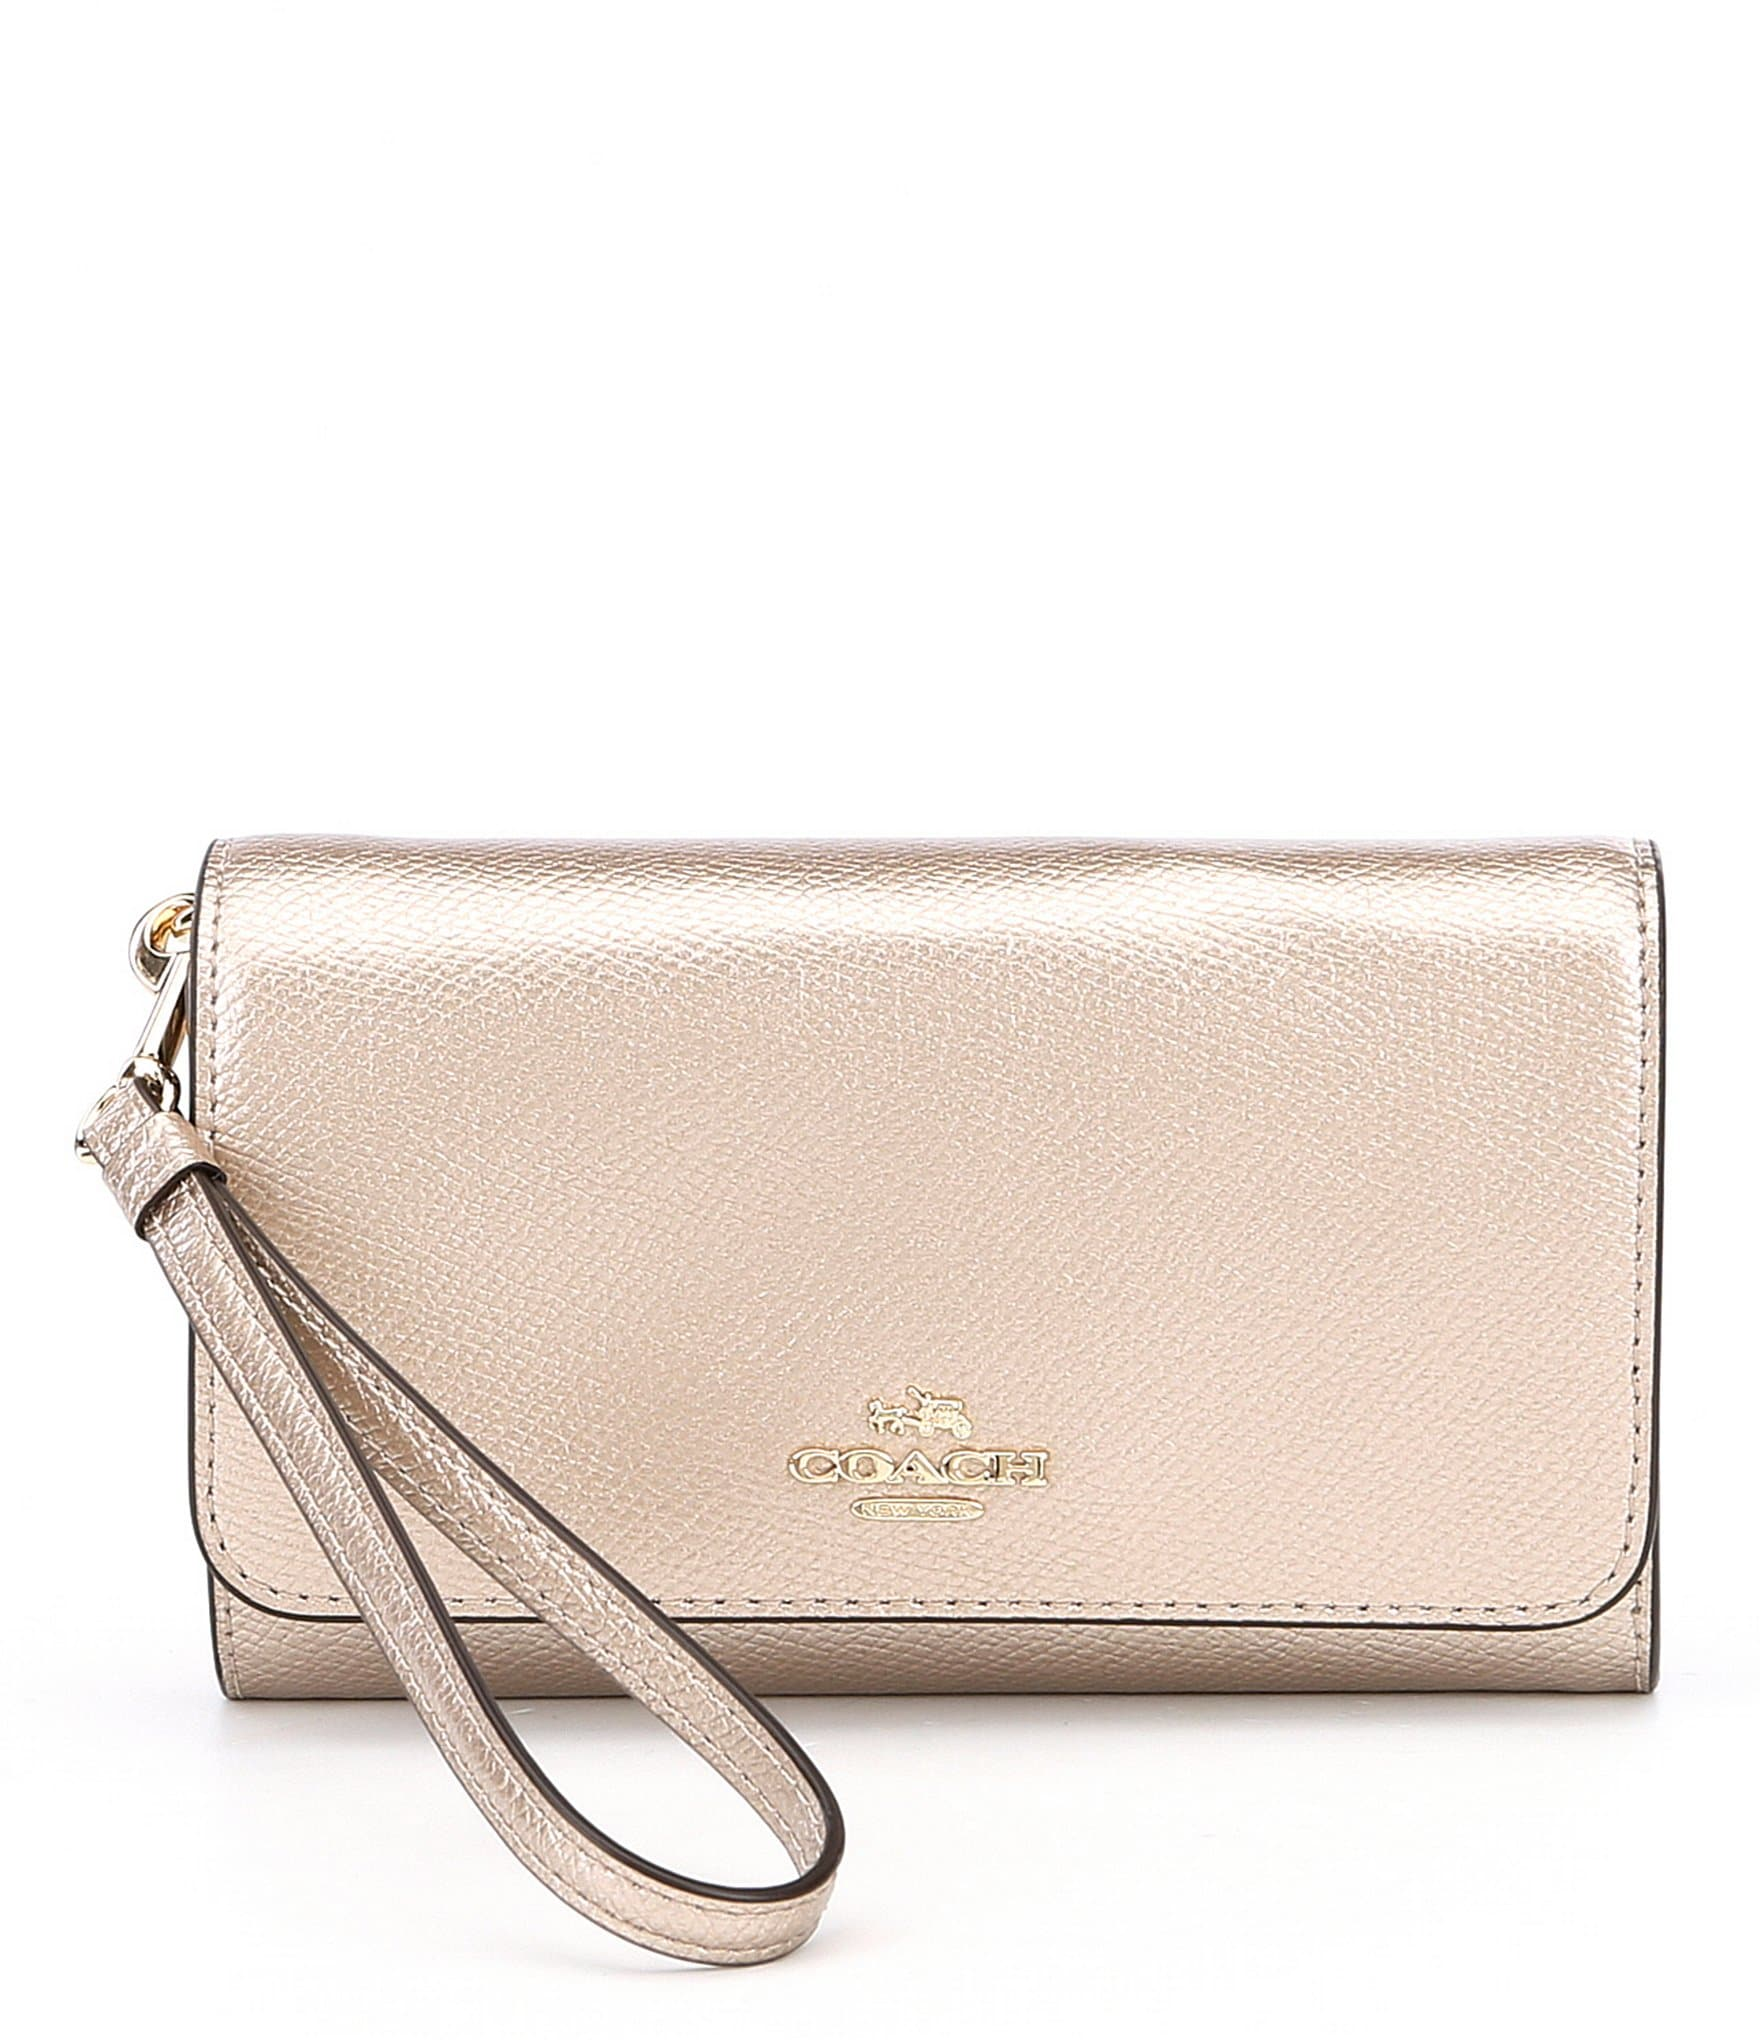 coach wristlets handbags usa knoxville tn rh pingmonitorapp com